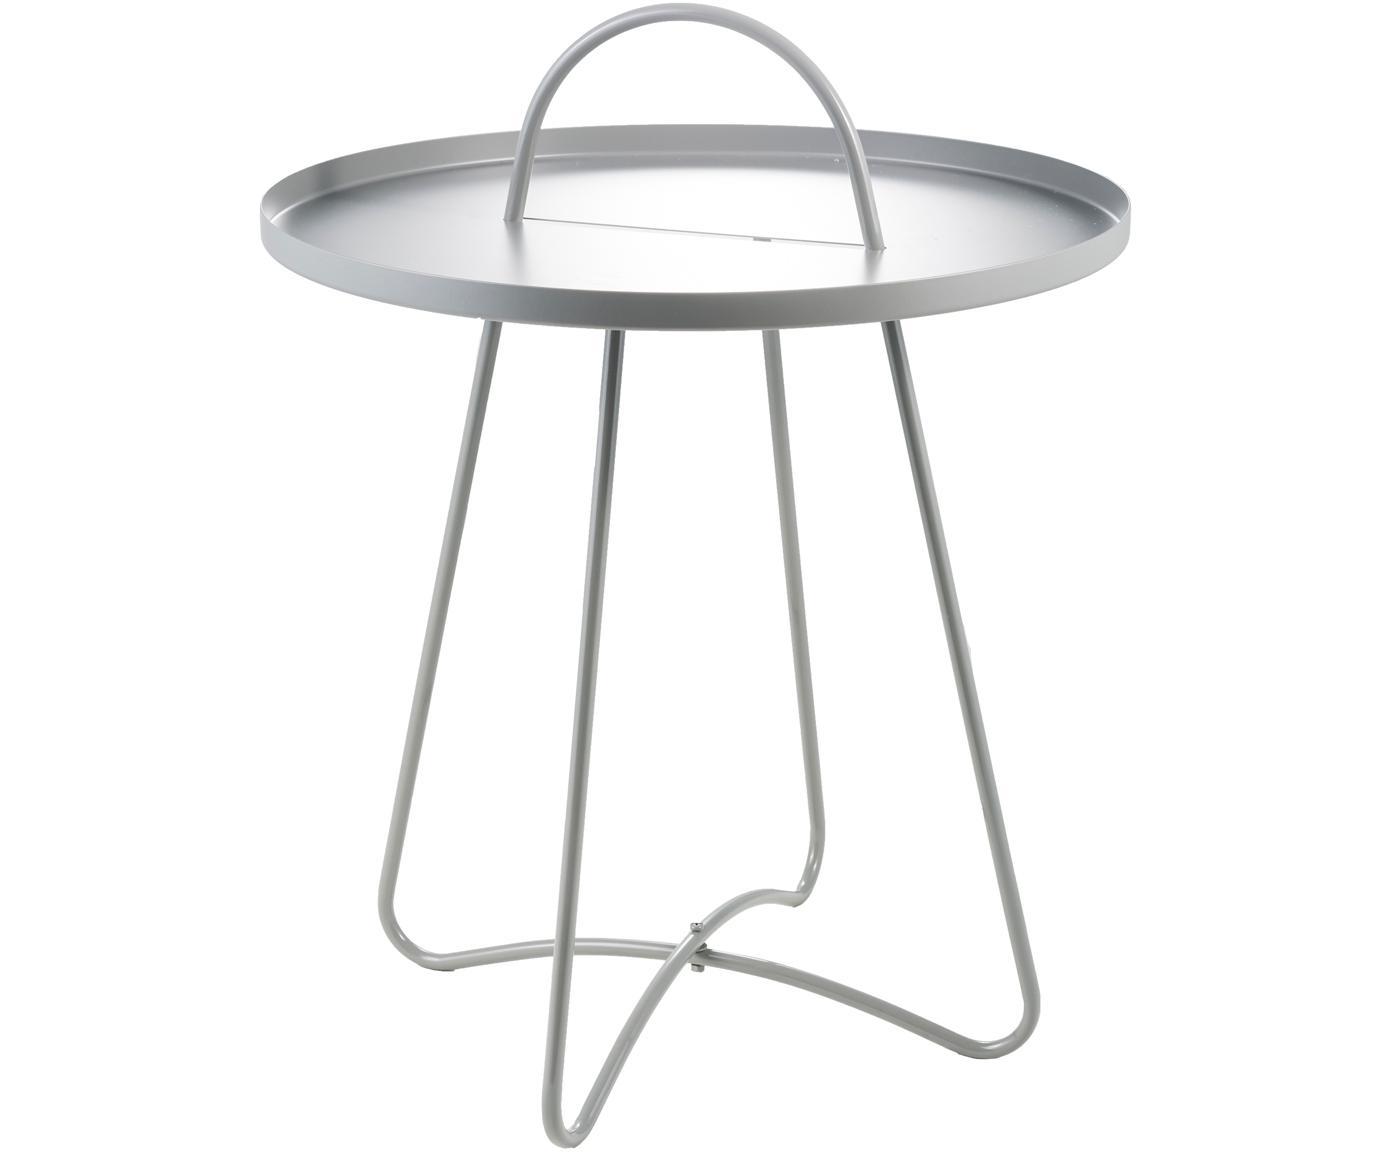 Tavolino rotondo in metallo Pronto, Metallo rivestito, Grigio chiaro, Ø 46 x Alt. 58 cm